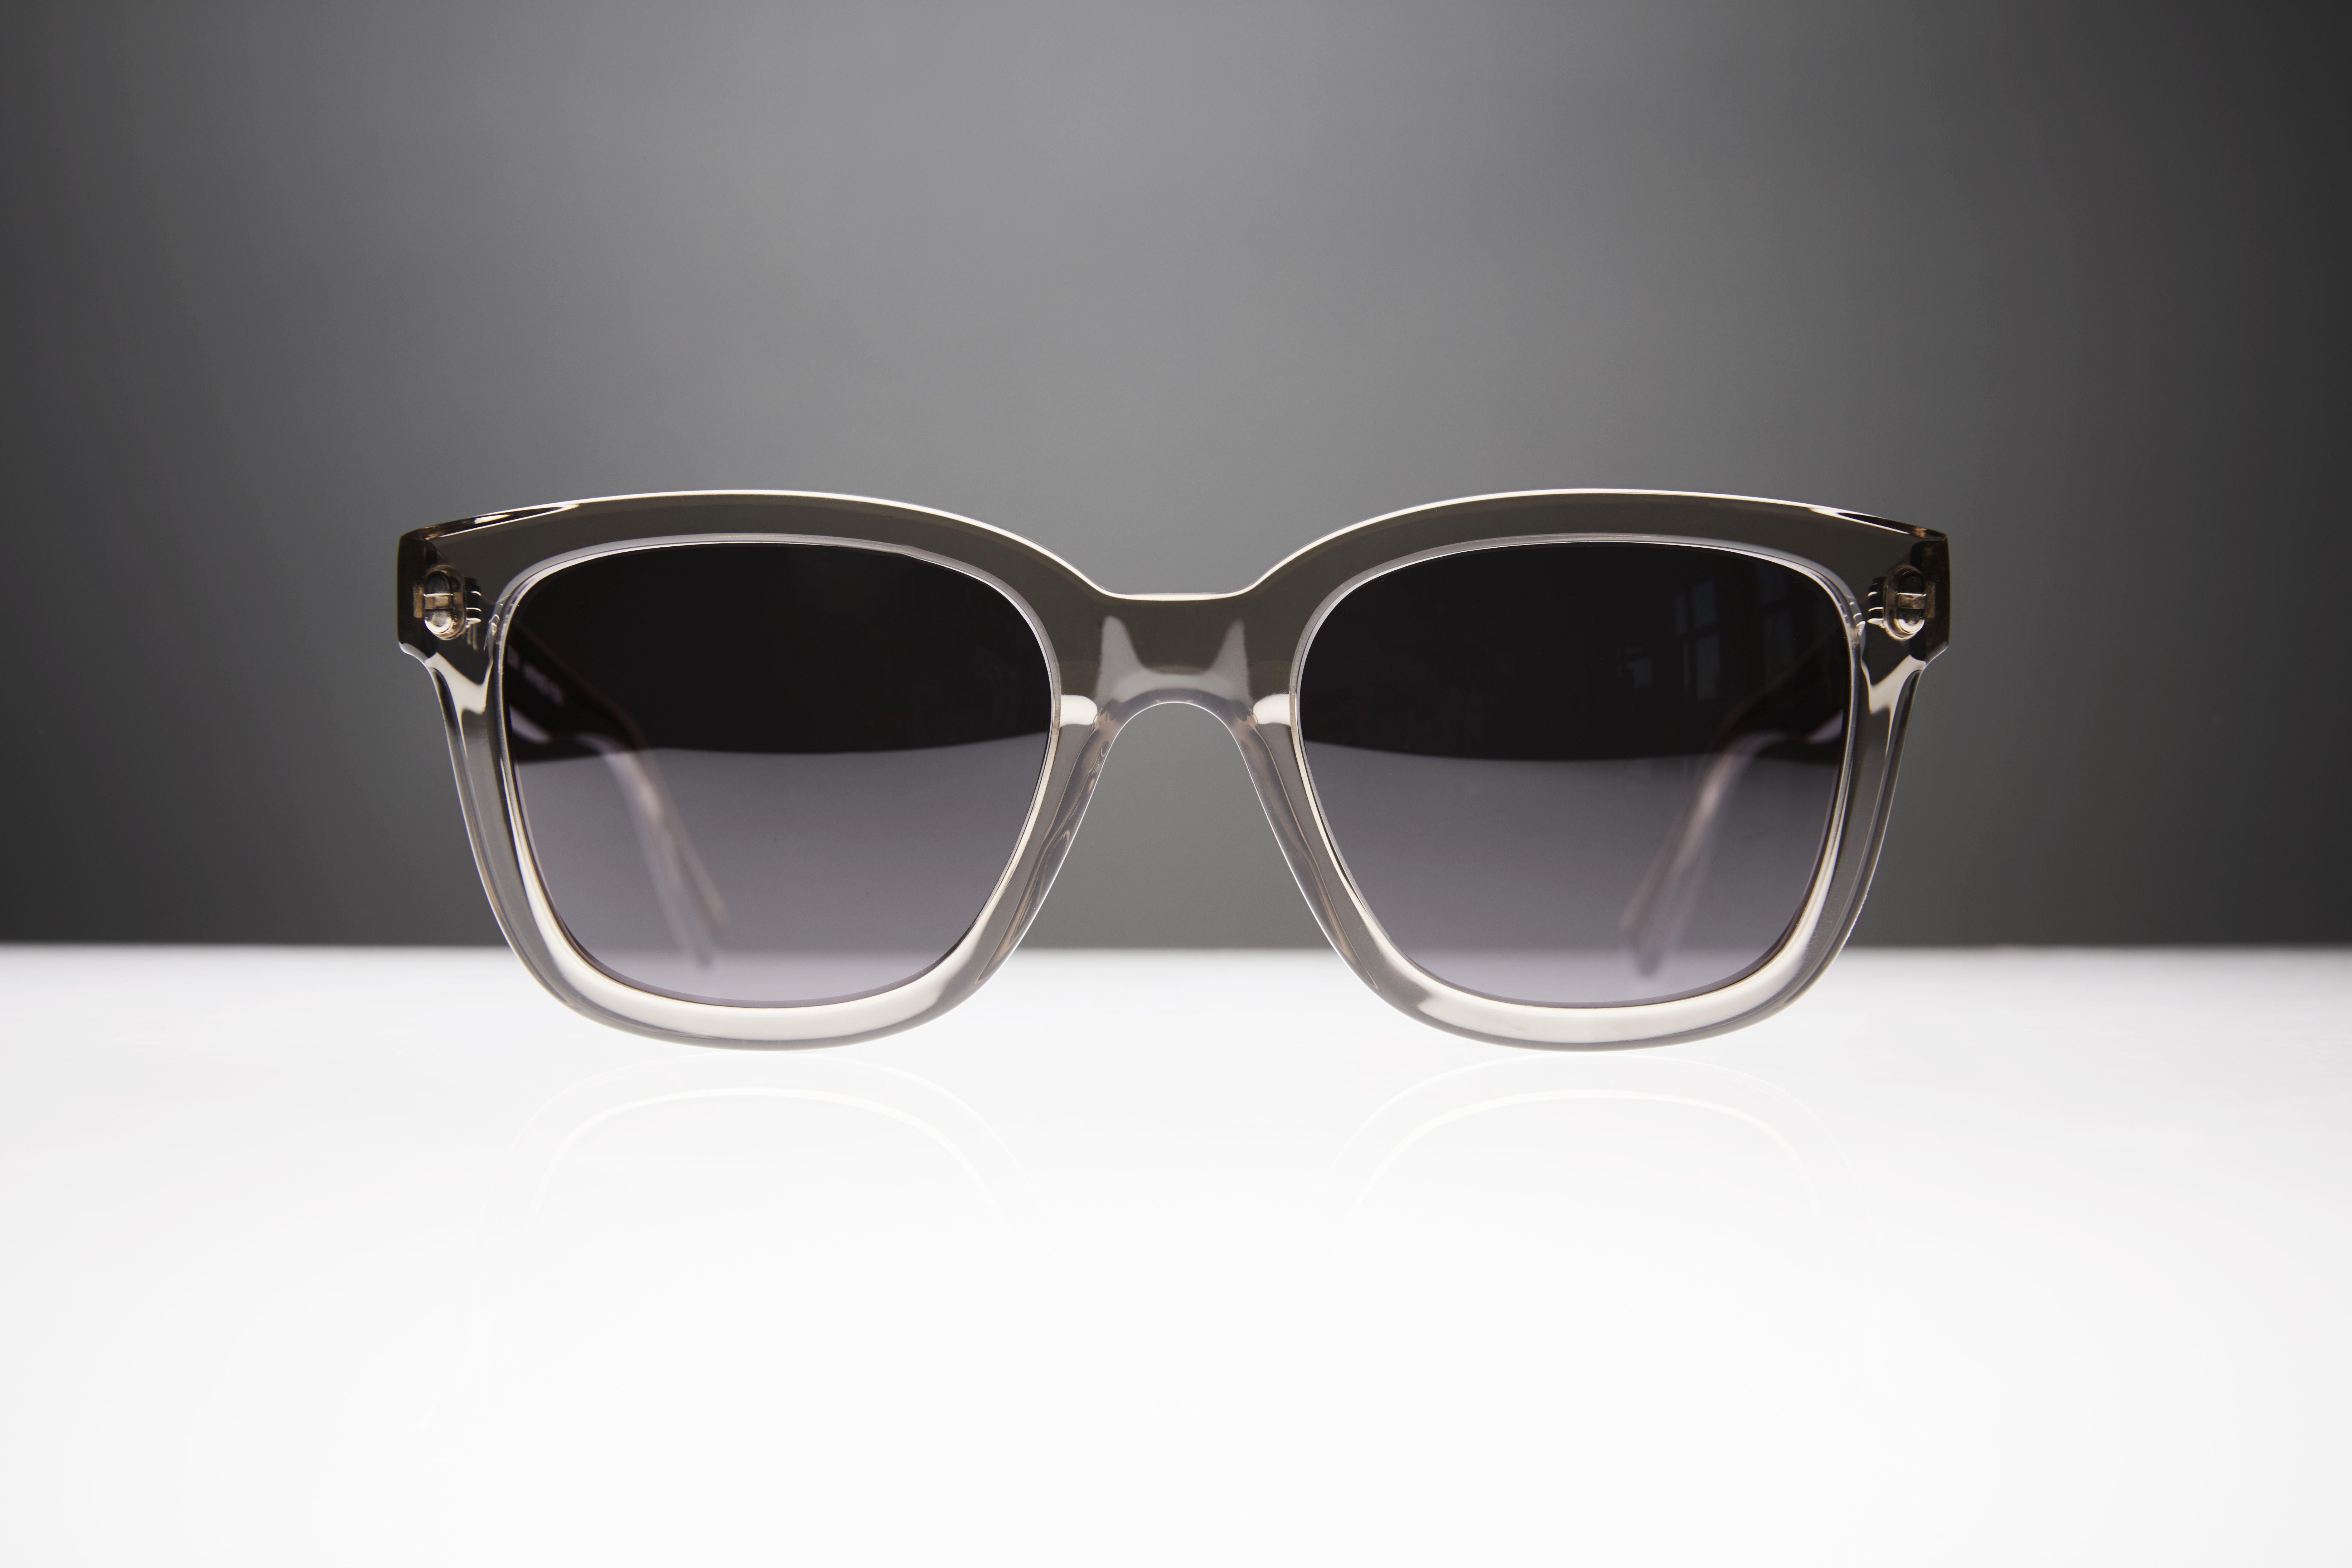 f3c0c084795 THE NOTORIOUS - More on www.shopviu.com   VIU Sunglasses in 2019 ...